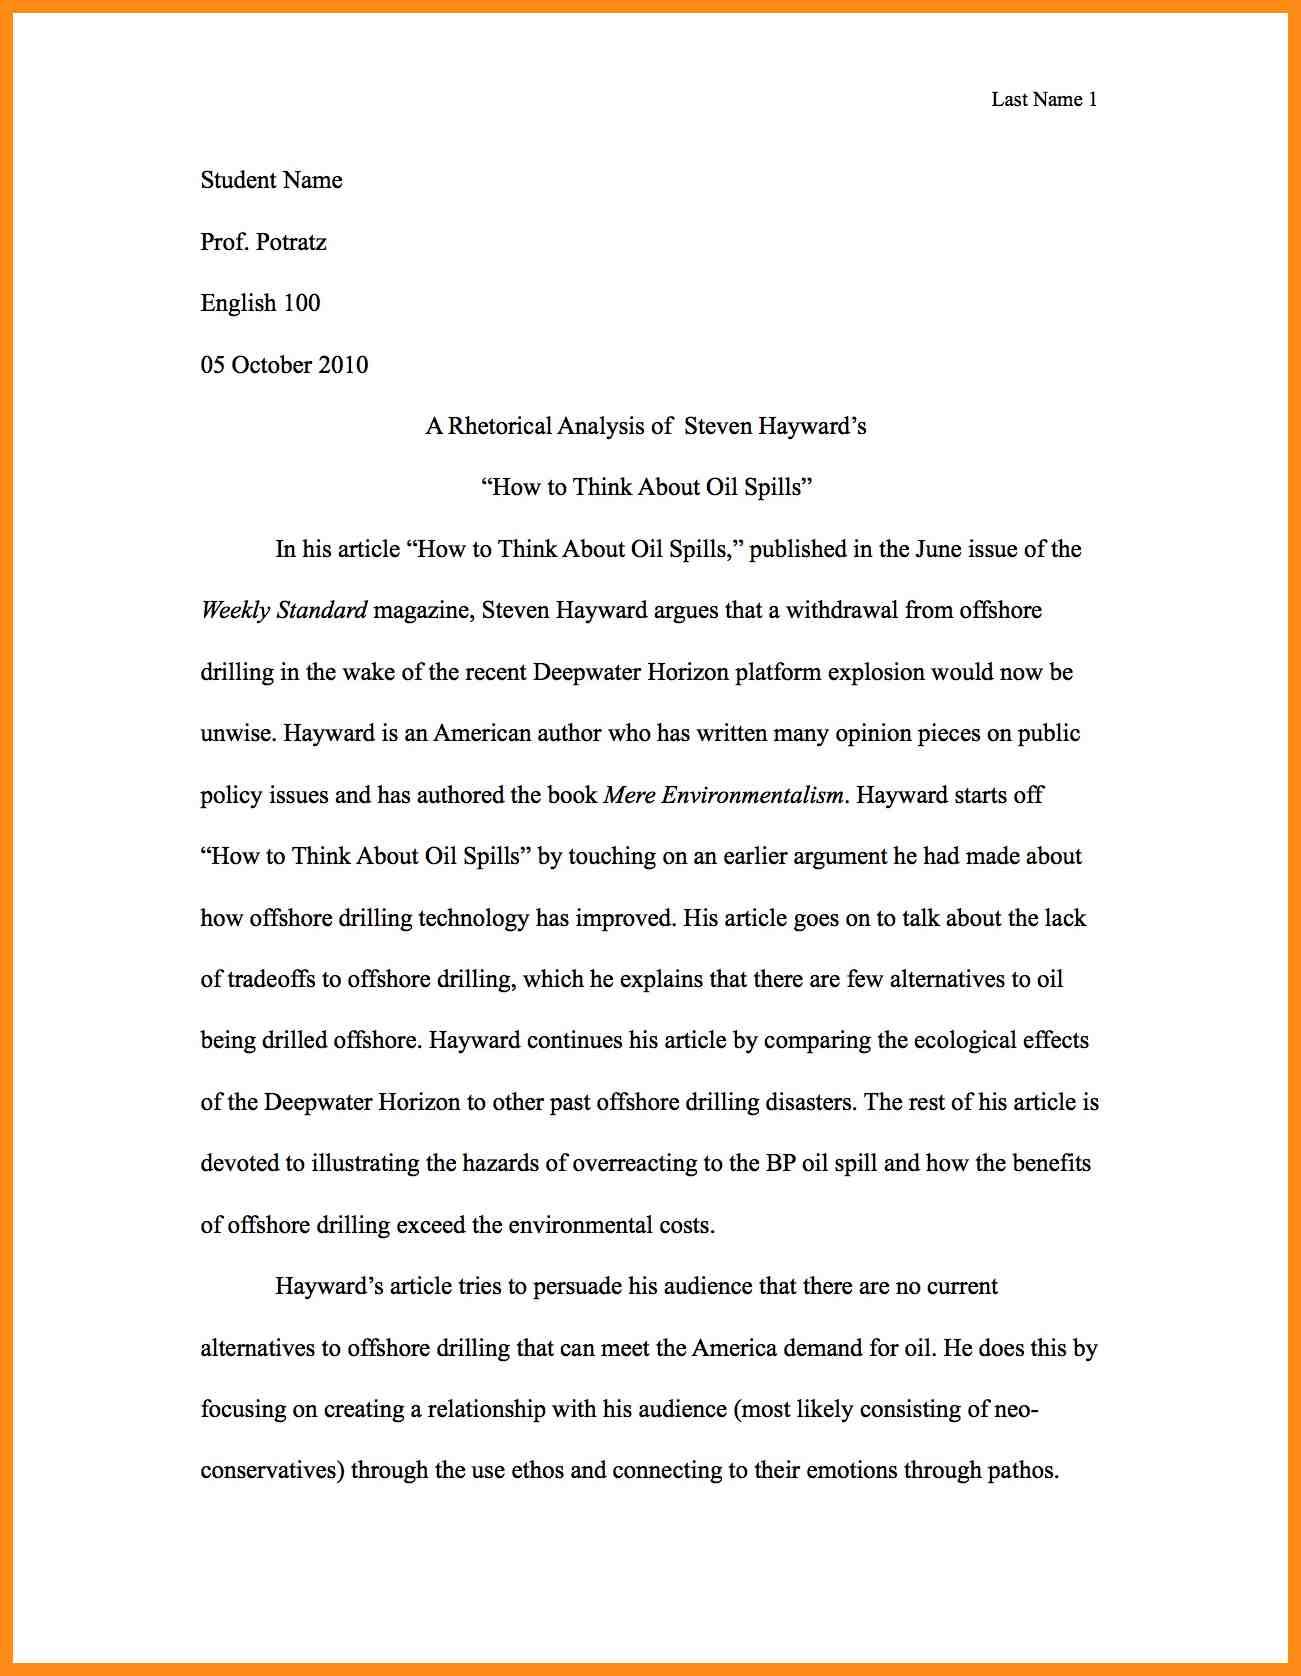 001 Essay Example Write Best Rhetorical Analysis Of Using Ethos Pathos And Logos Breathtaking Outline Sample Ap Lang Topics 2016 Full